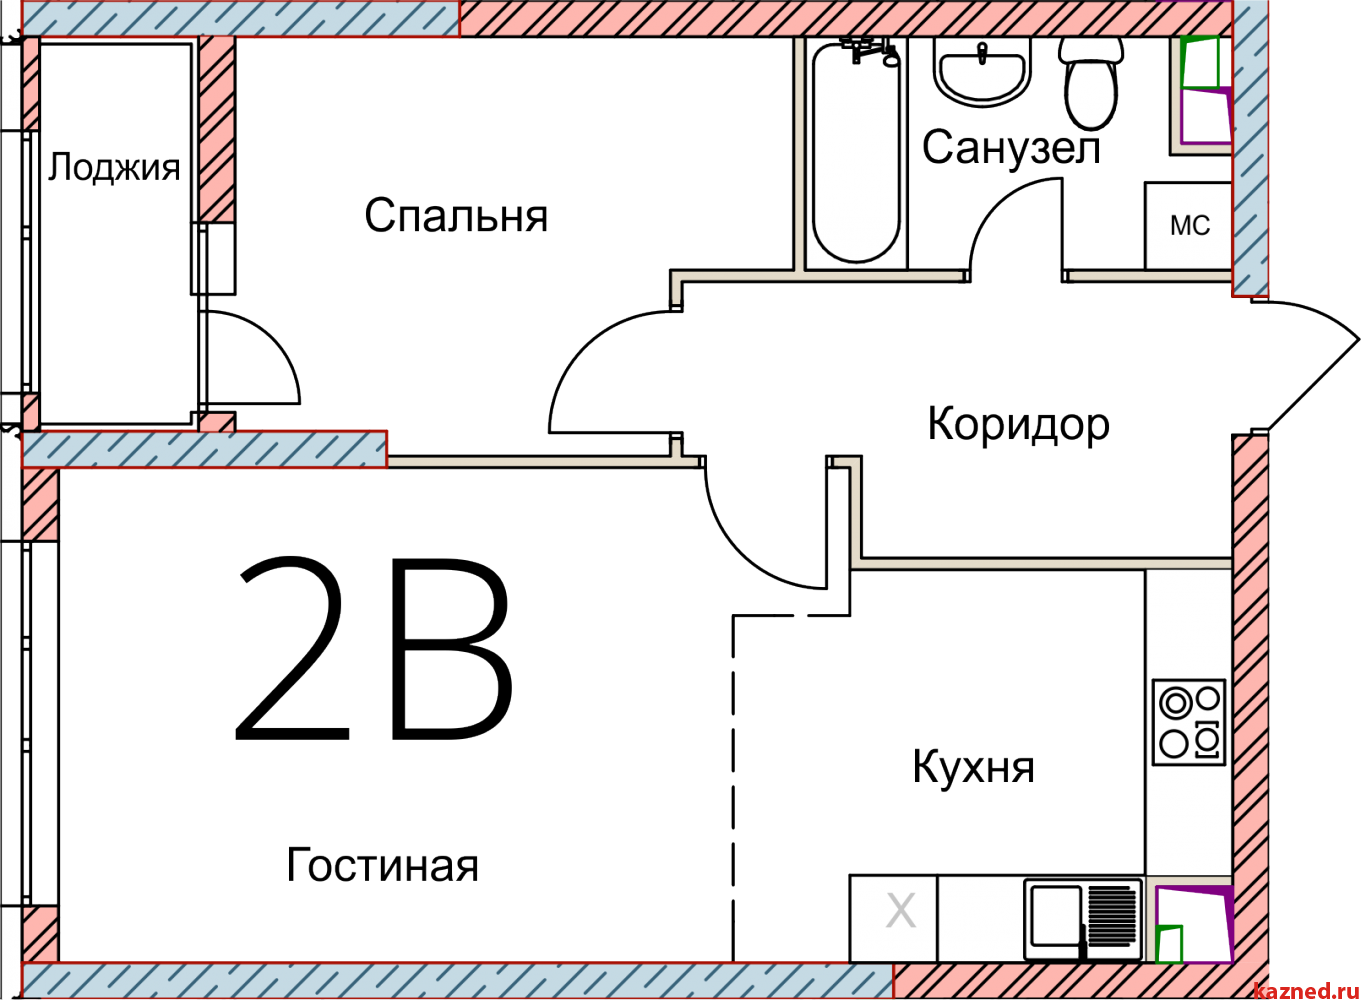 Продажа 2-к квартиры Кул Гали, 3, 47 м2  (миниатюра №2)